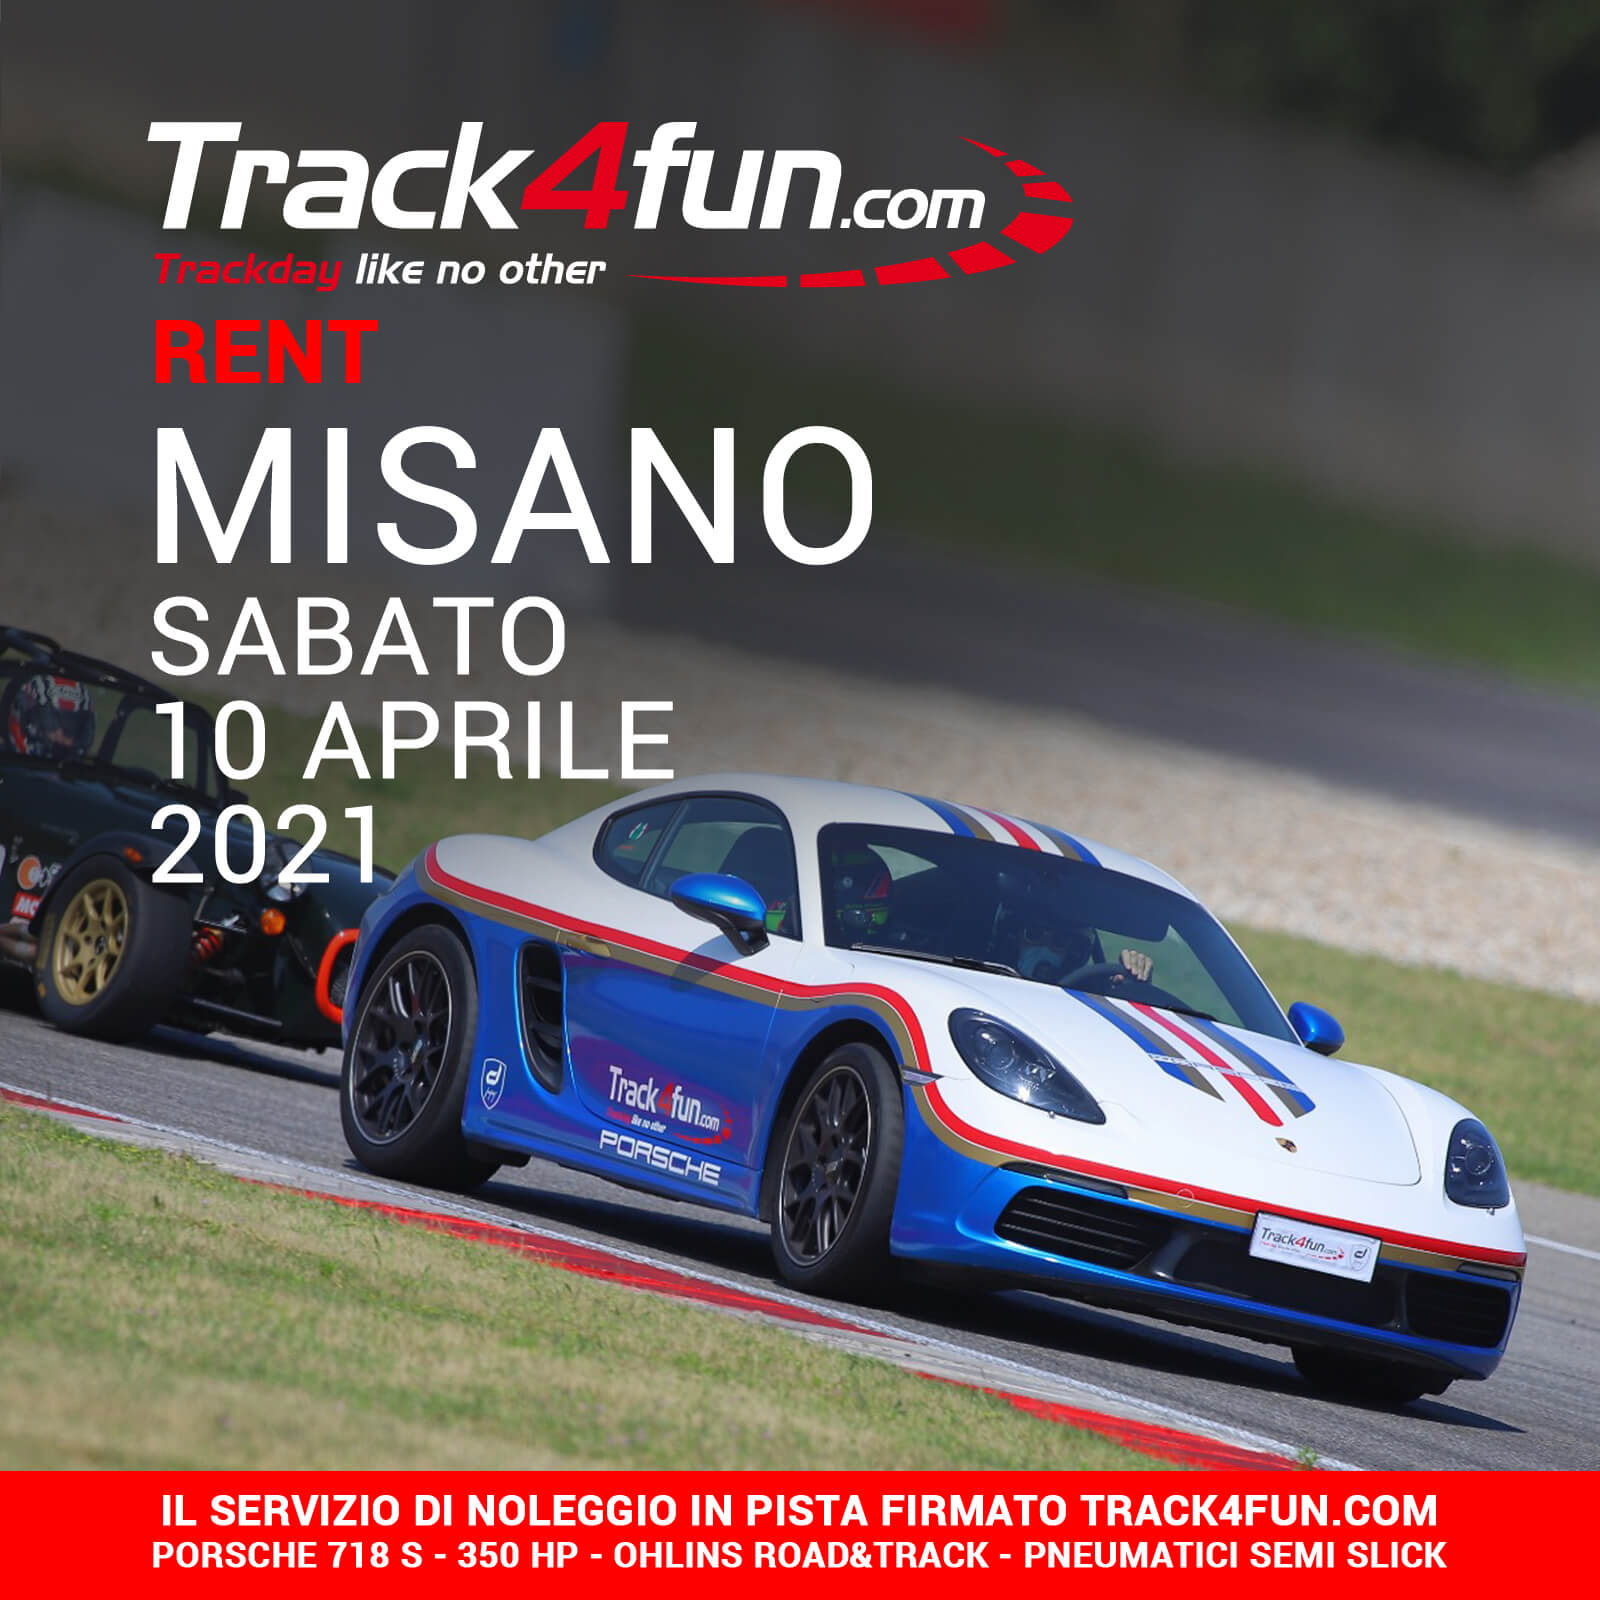 Track4fun Rent Misano 10-04-2021